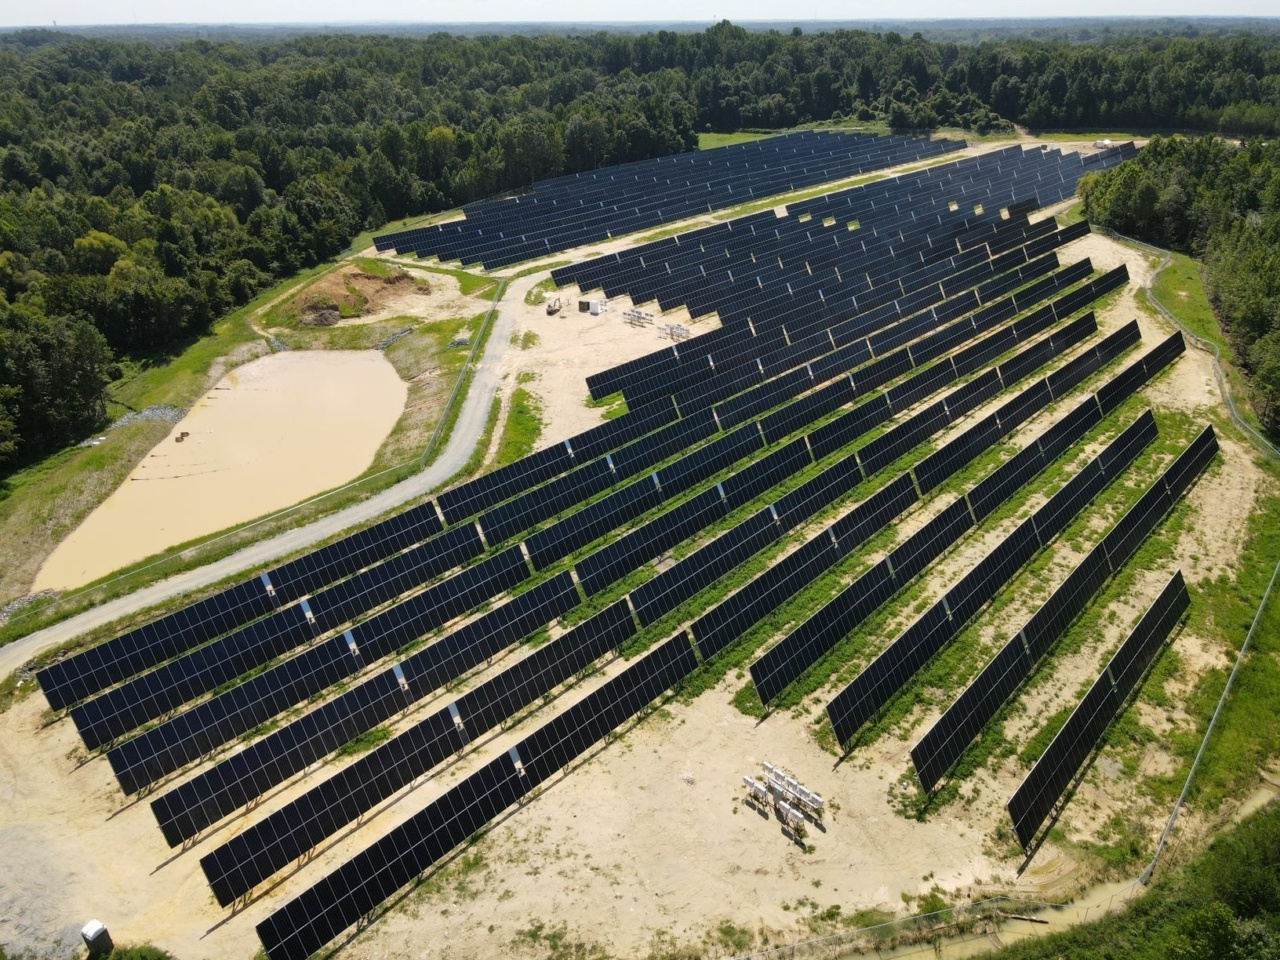 Solarpark Luftaufnahme